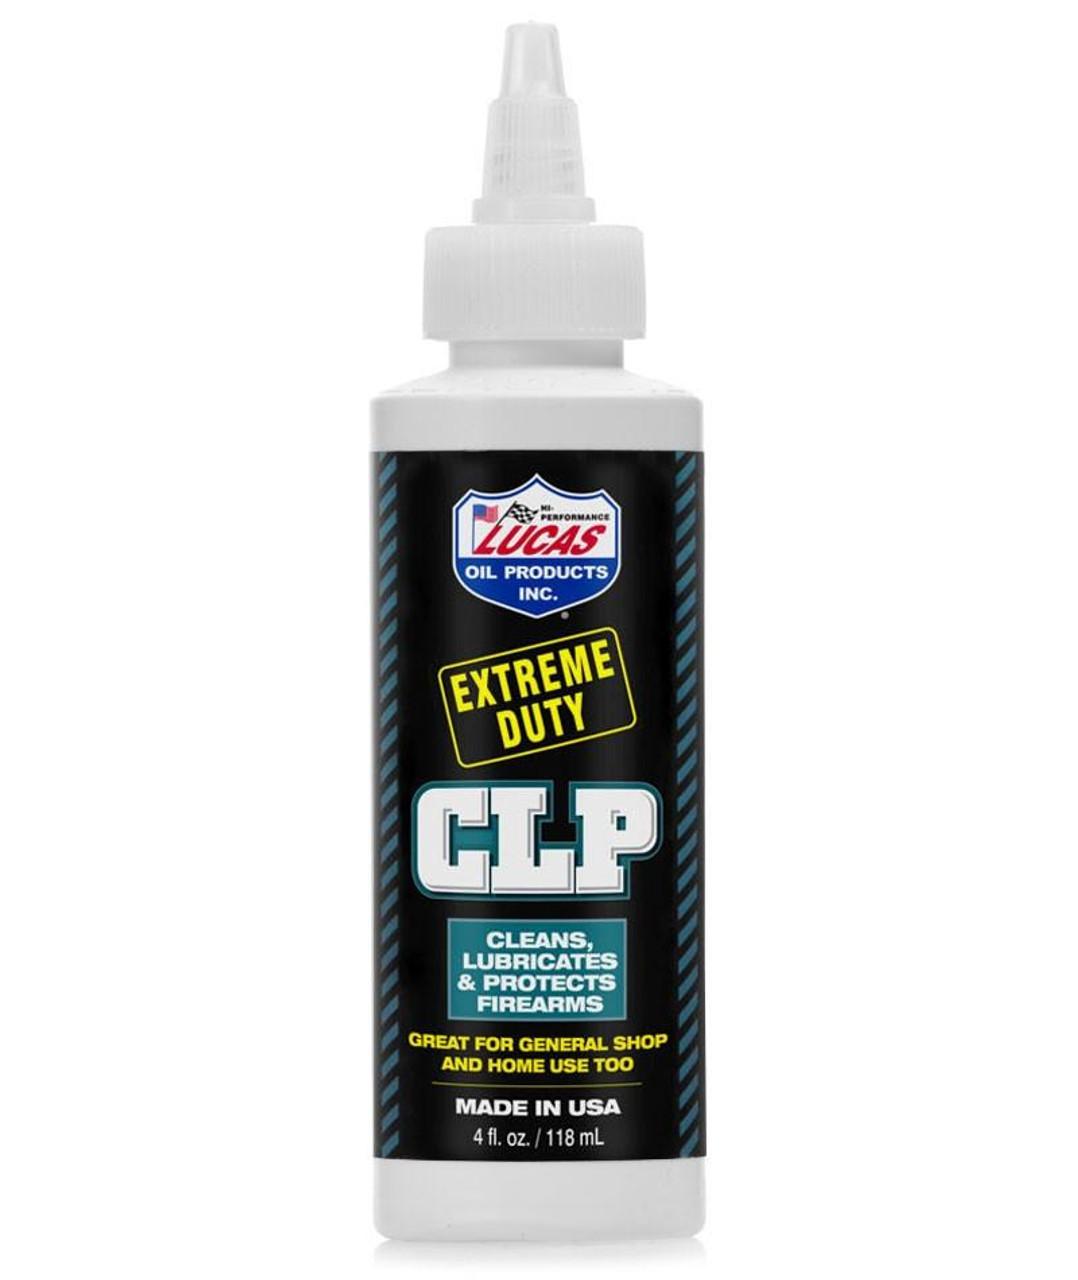 Lucas Extreme Duty CLP - 4 oz